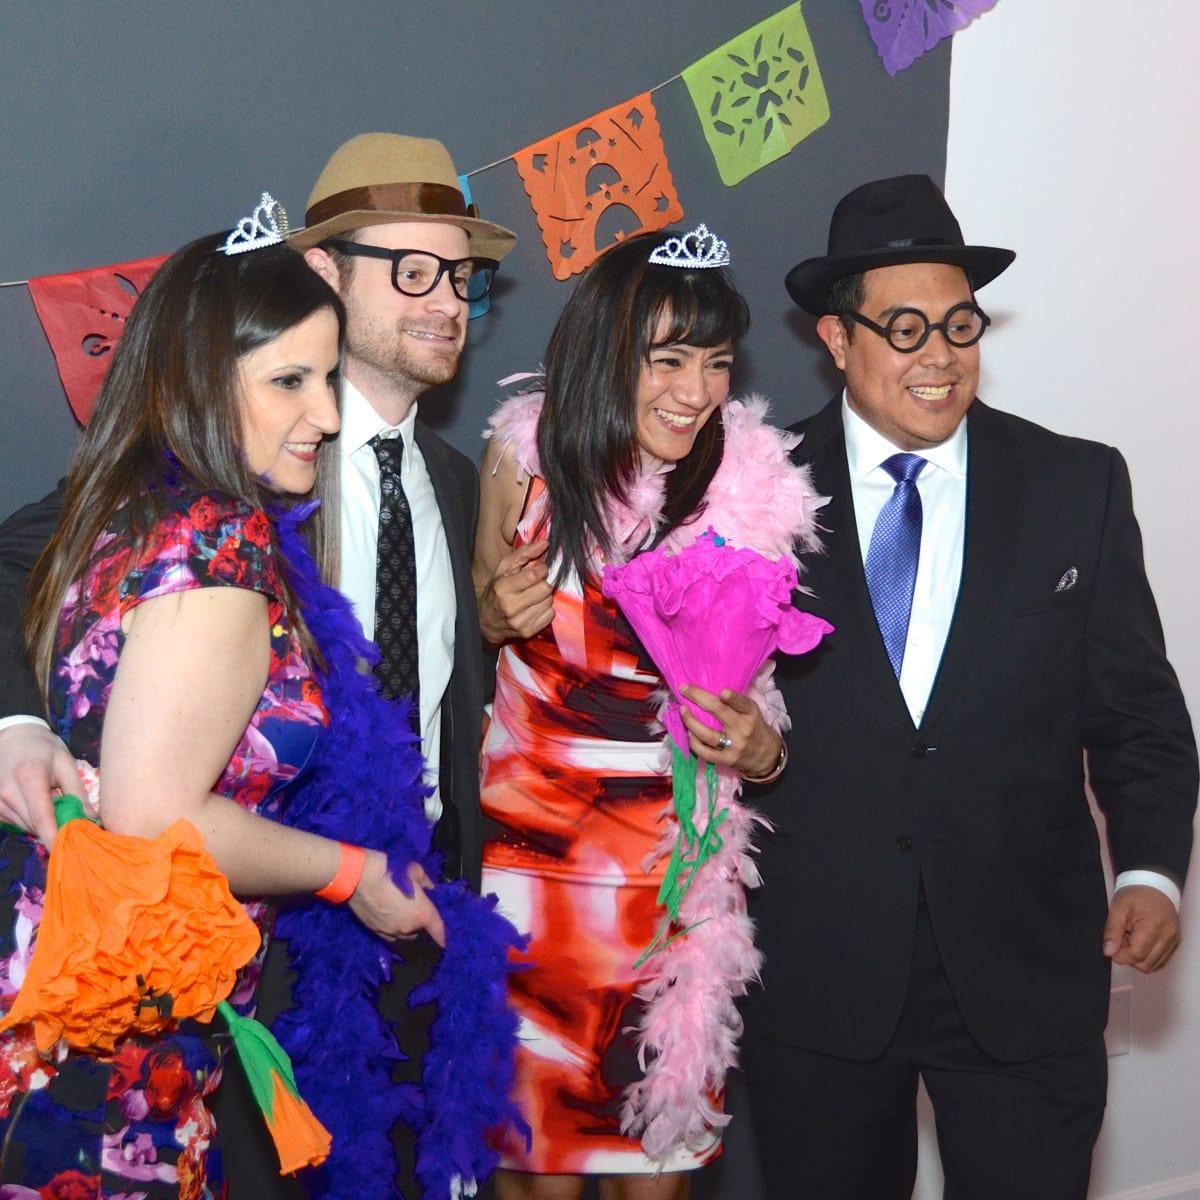 Center for Contemporary Craft, Margarita Madness, Jan. 2016, Erika Garza, Michael Loomis, Adriana Tristan, and Mark Alcocer